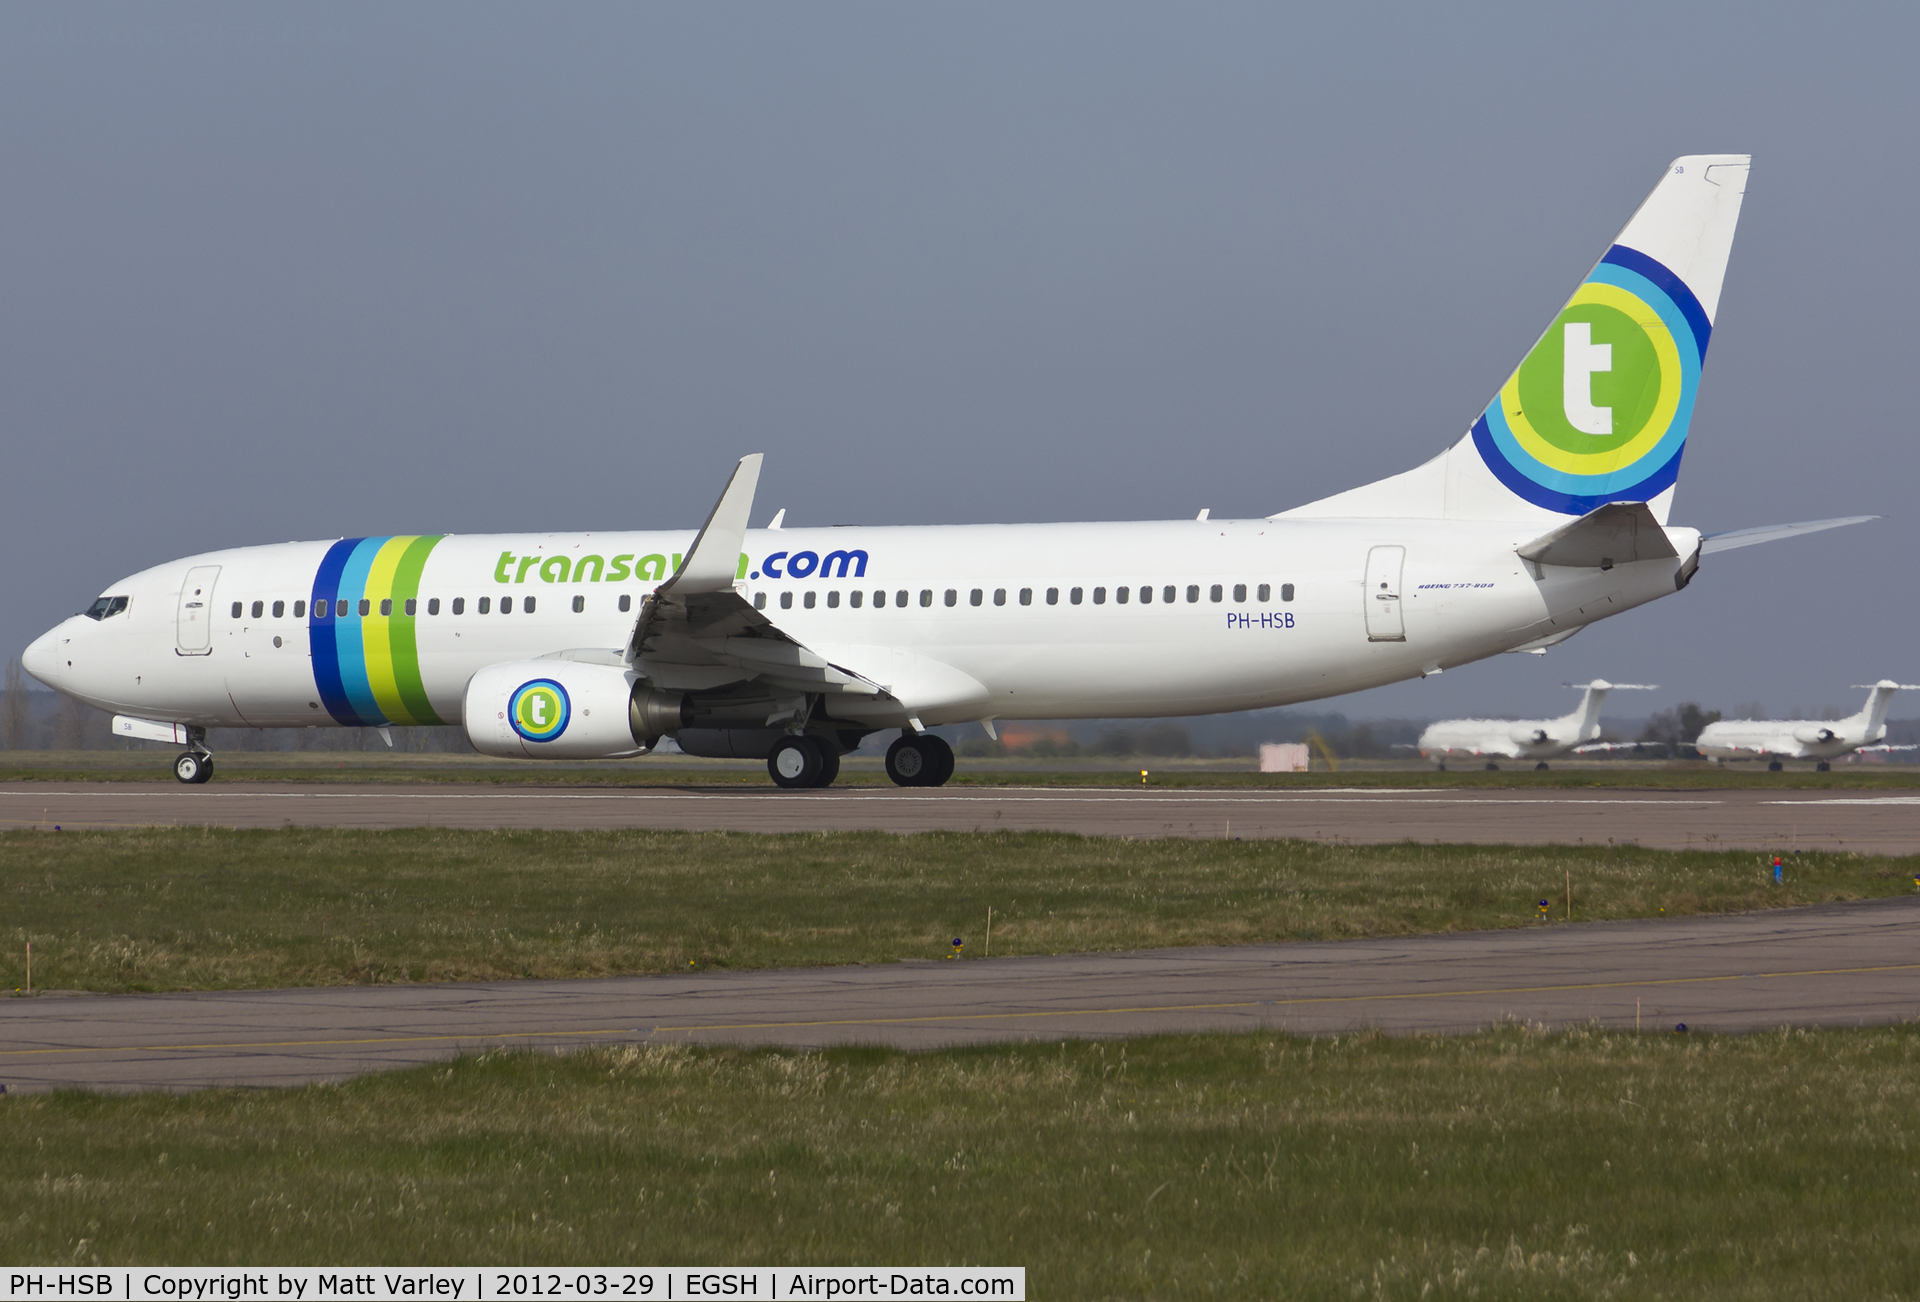 PH-HSB, 2010 Boeing 737-8K2 C/N 34172, Departing EGSH.